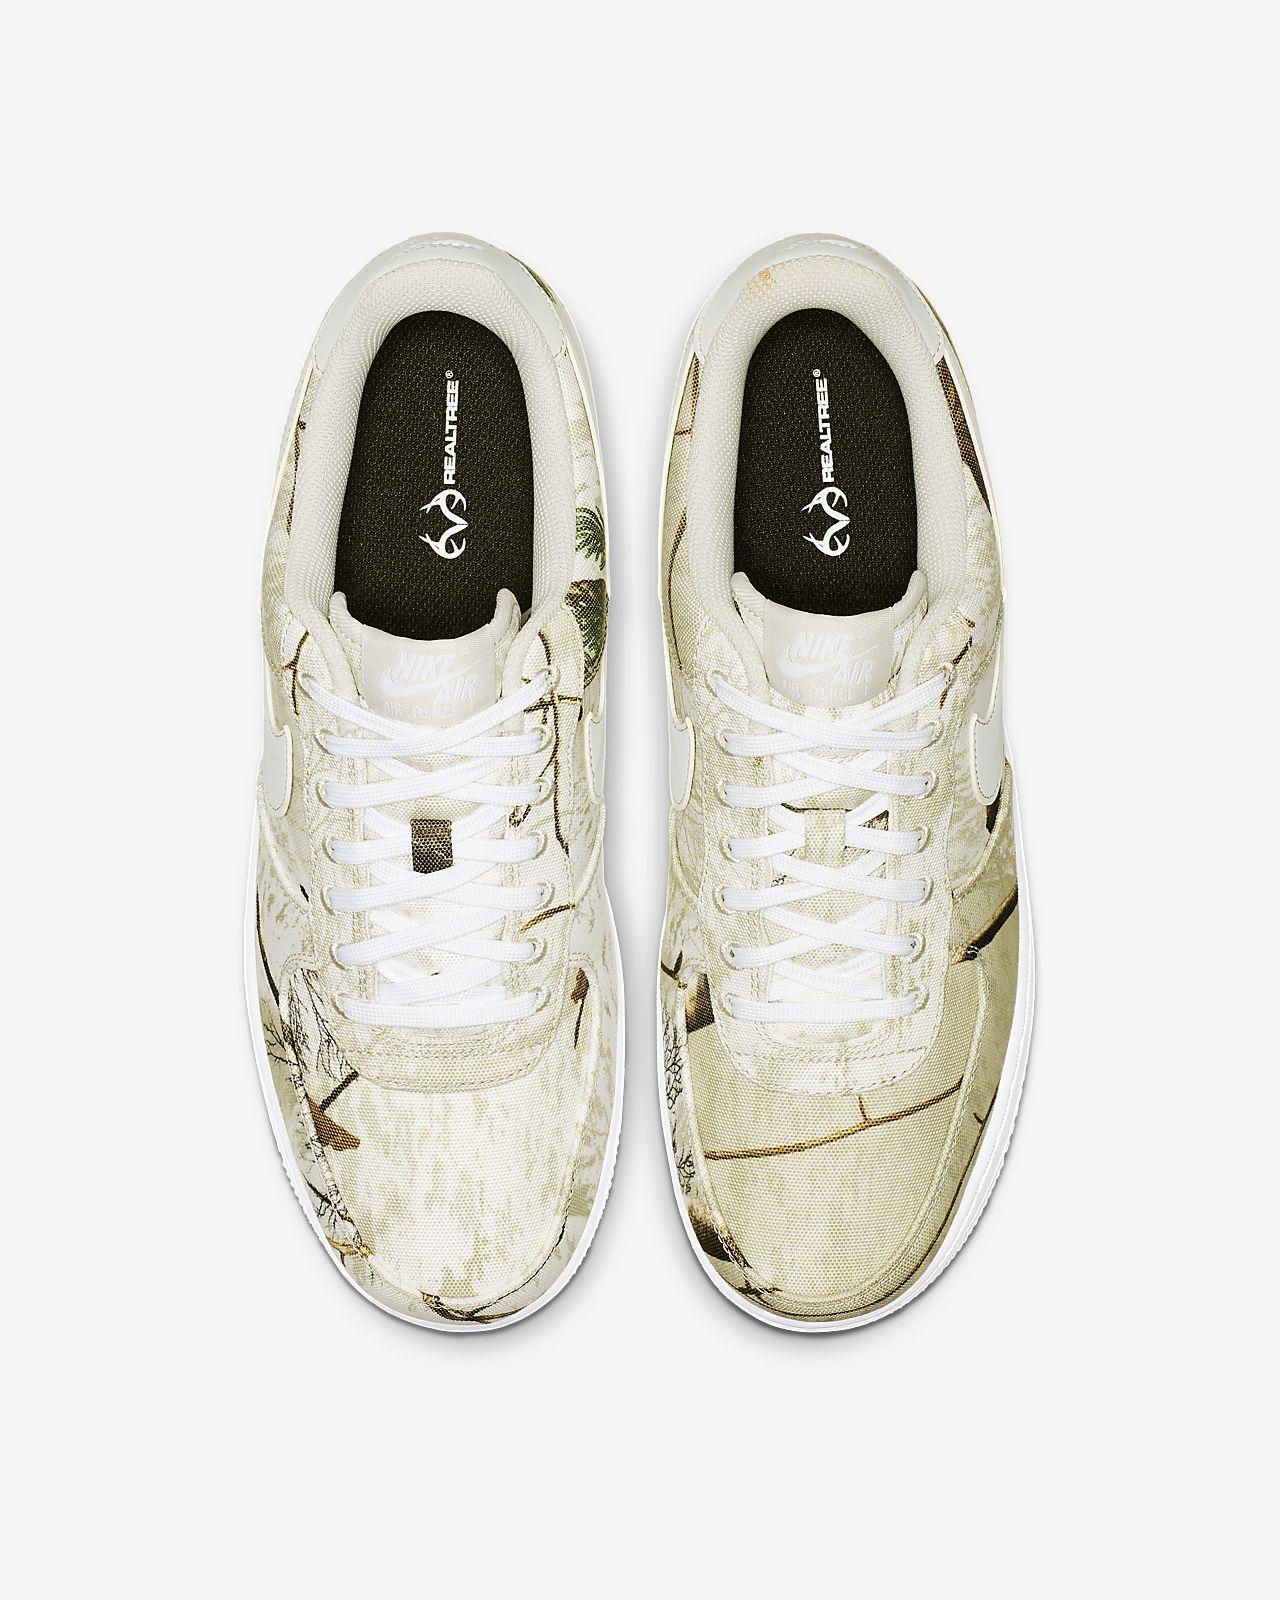 half off 348b3 b7cc7 ... Nike Air Force 1  07 LV8 3 Realtree® Men s Shoe